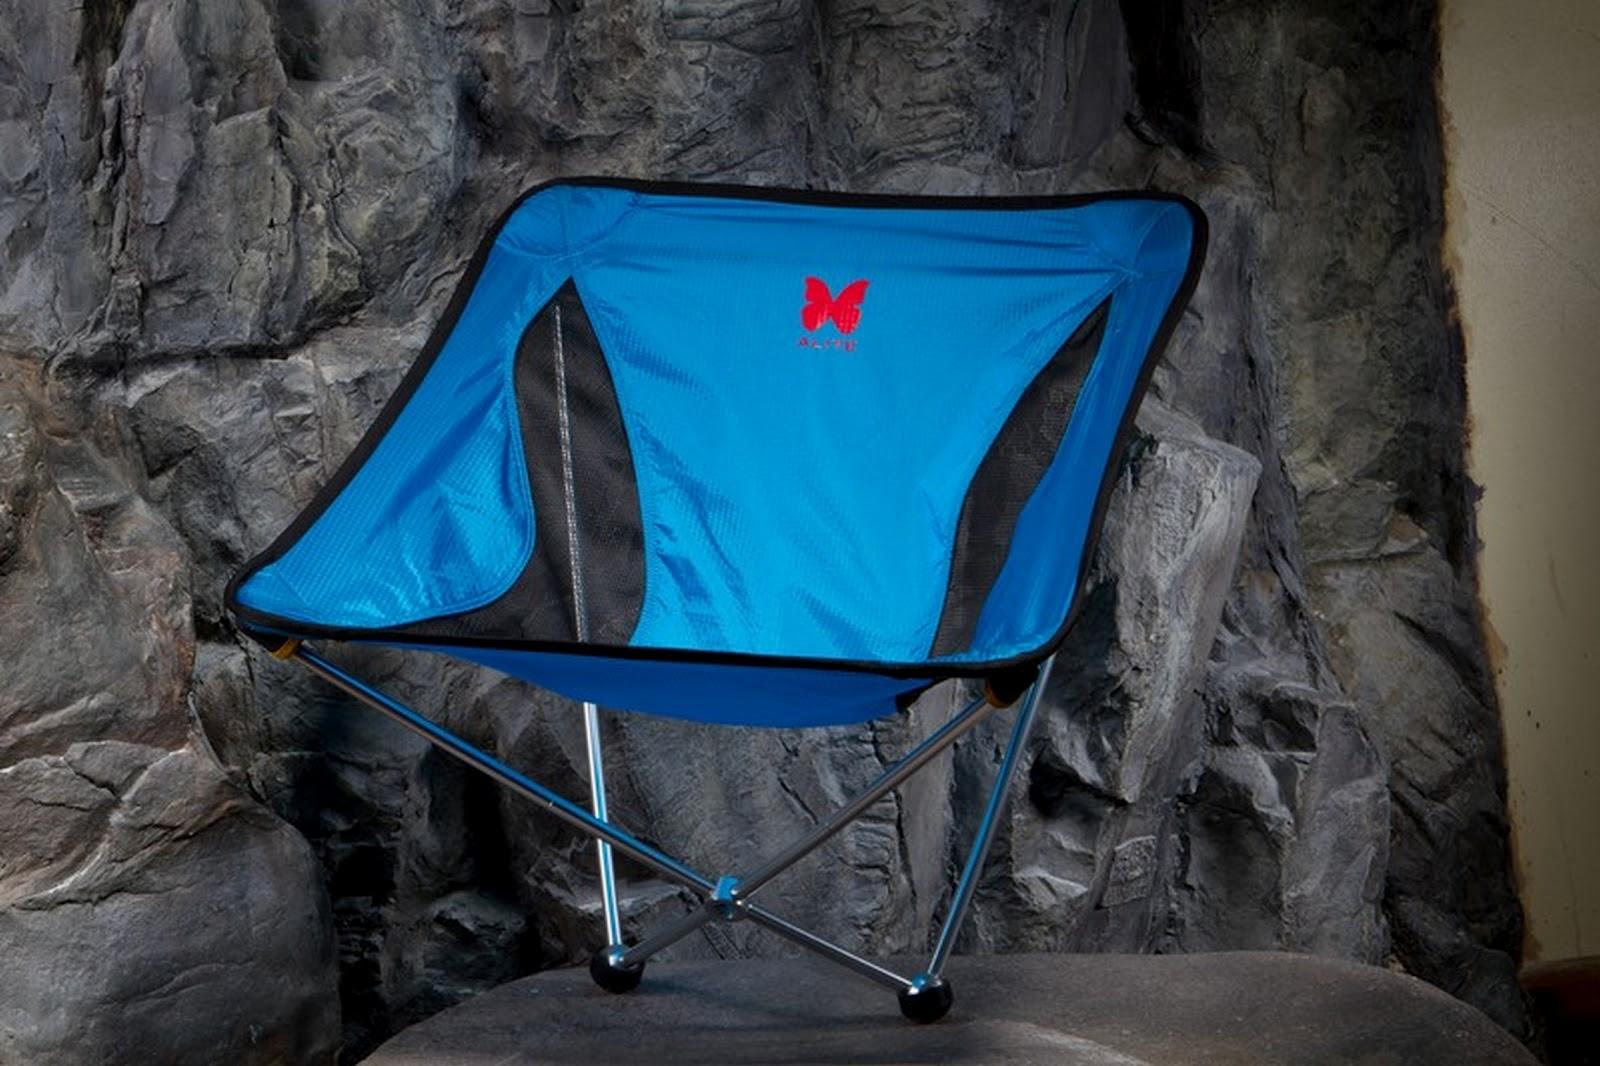 Alite Monarch Chair Warranty Wheelchair Shower Hot Air Balloon Fiesta To Showcase Exciting Aerial Stunts